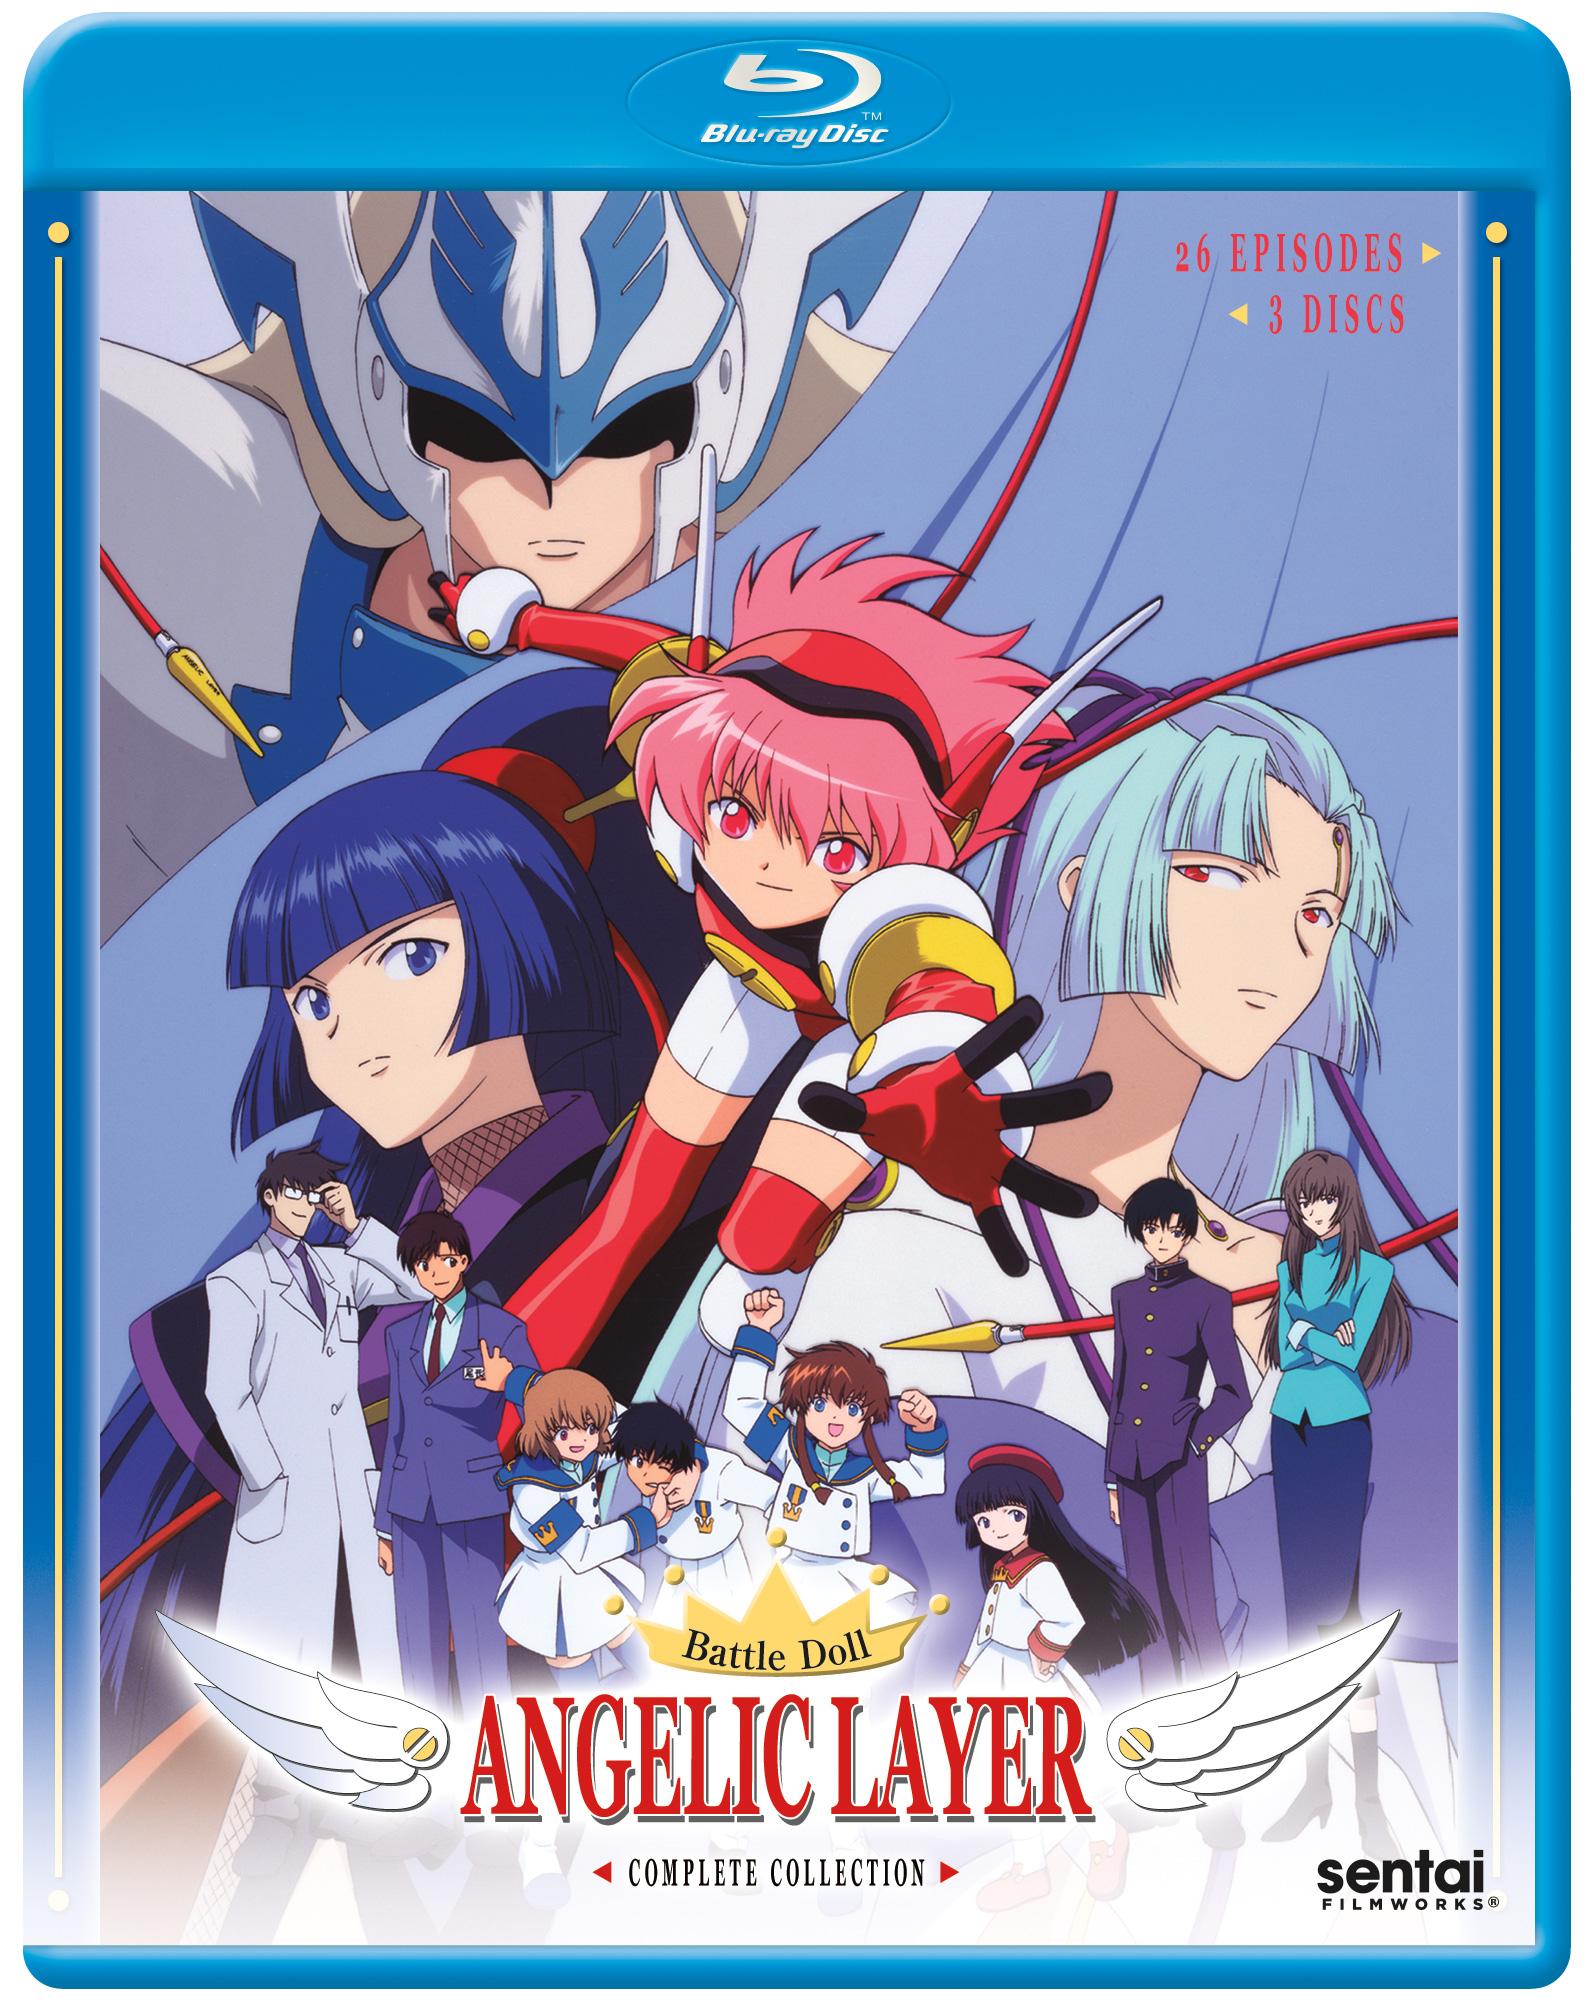 Angelic Layer Blu-ray